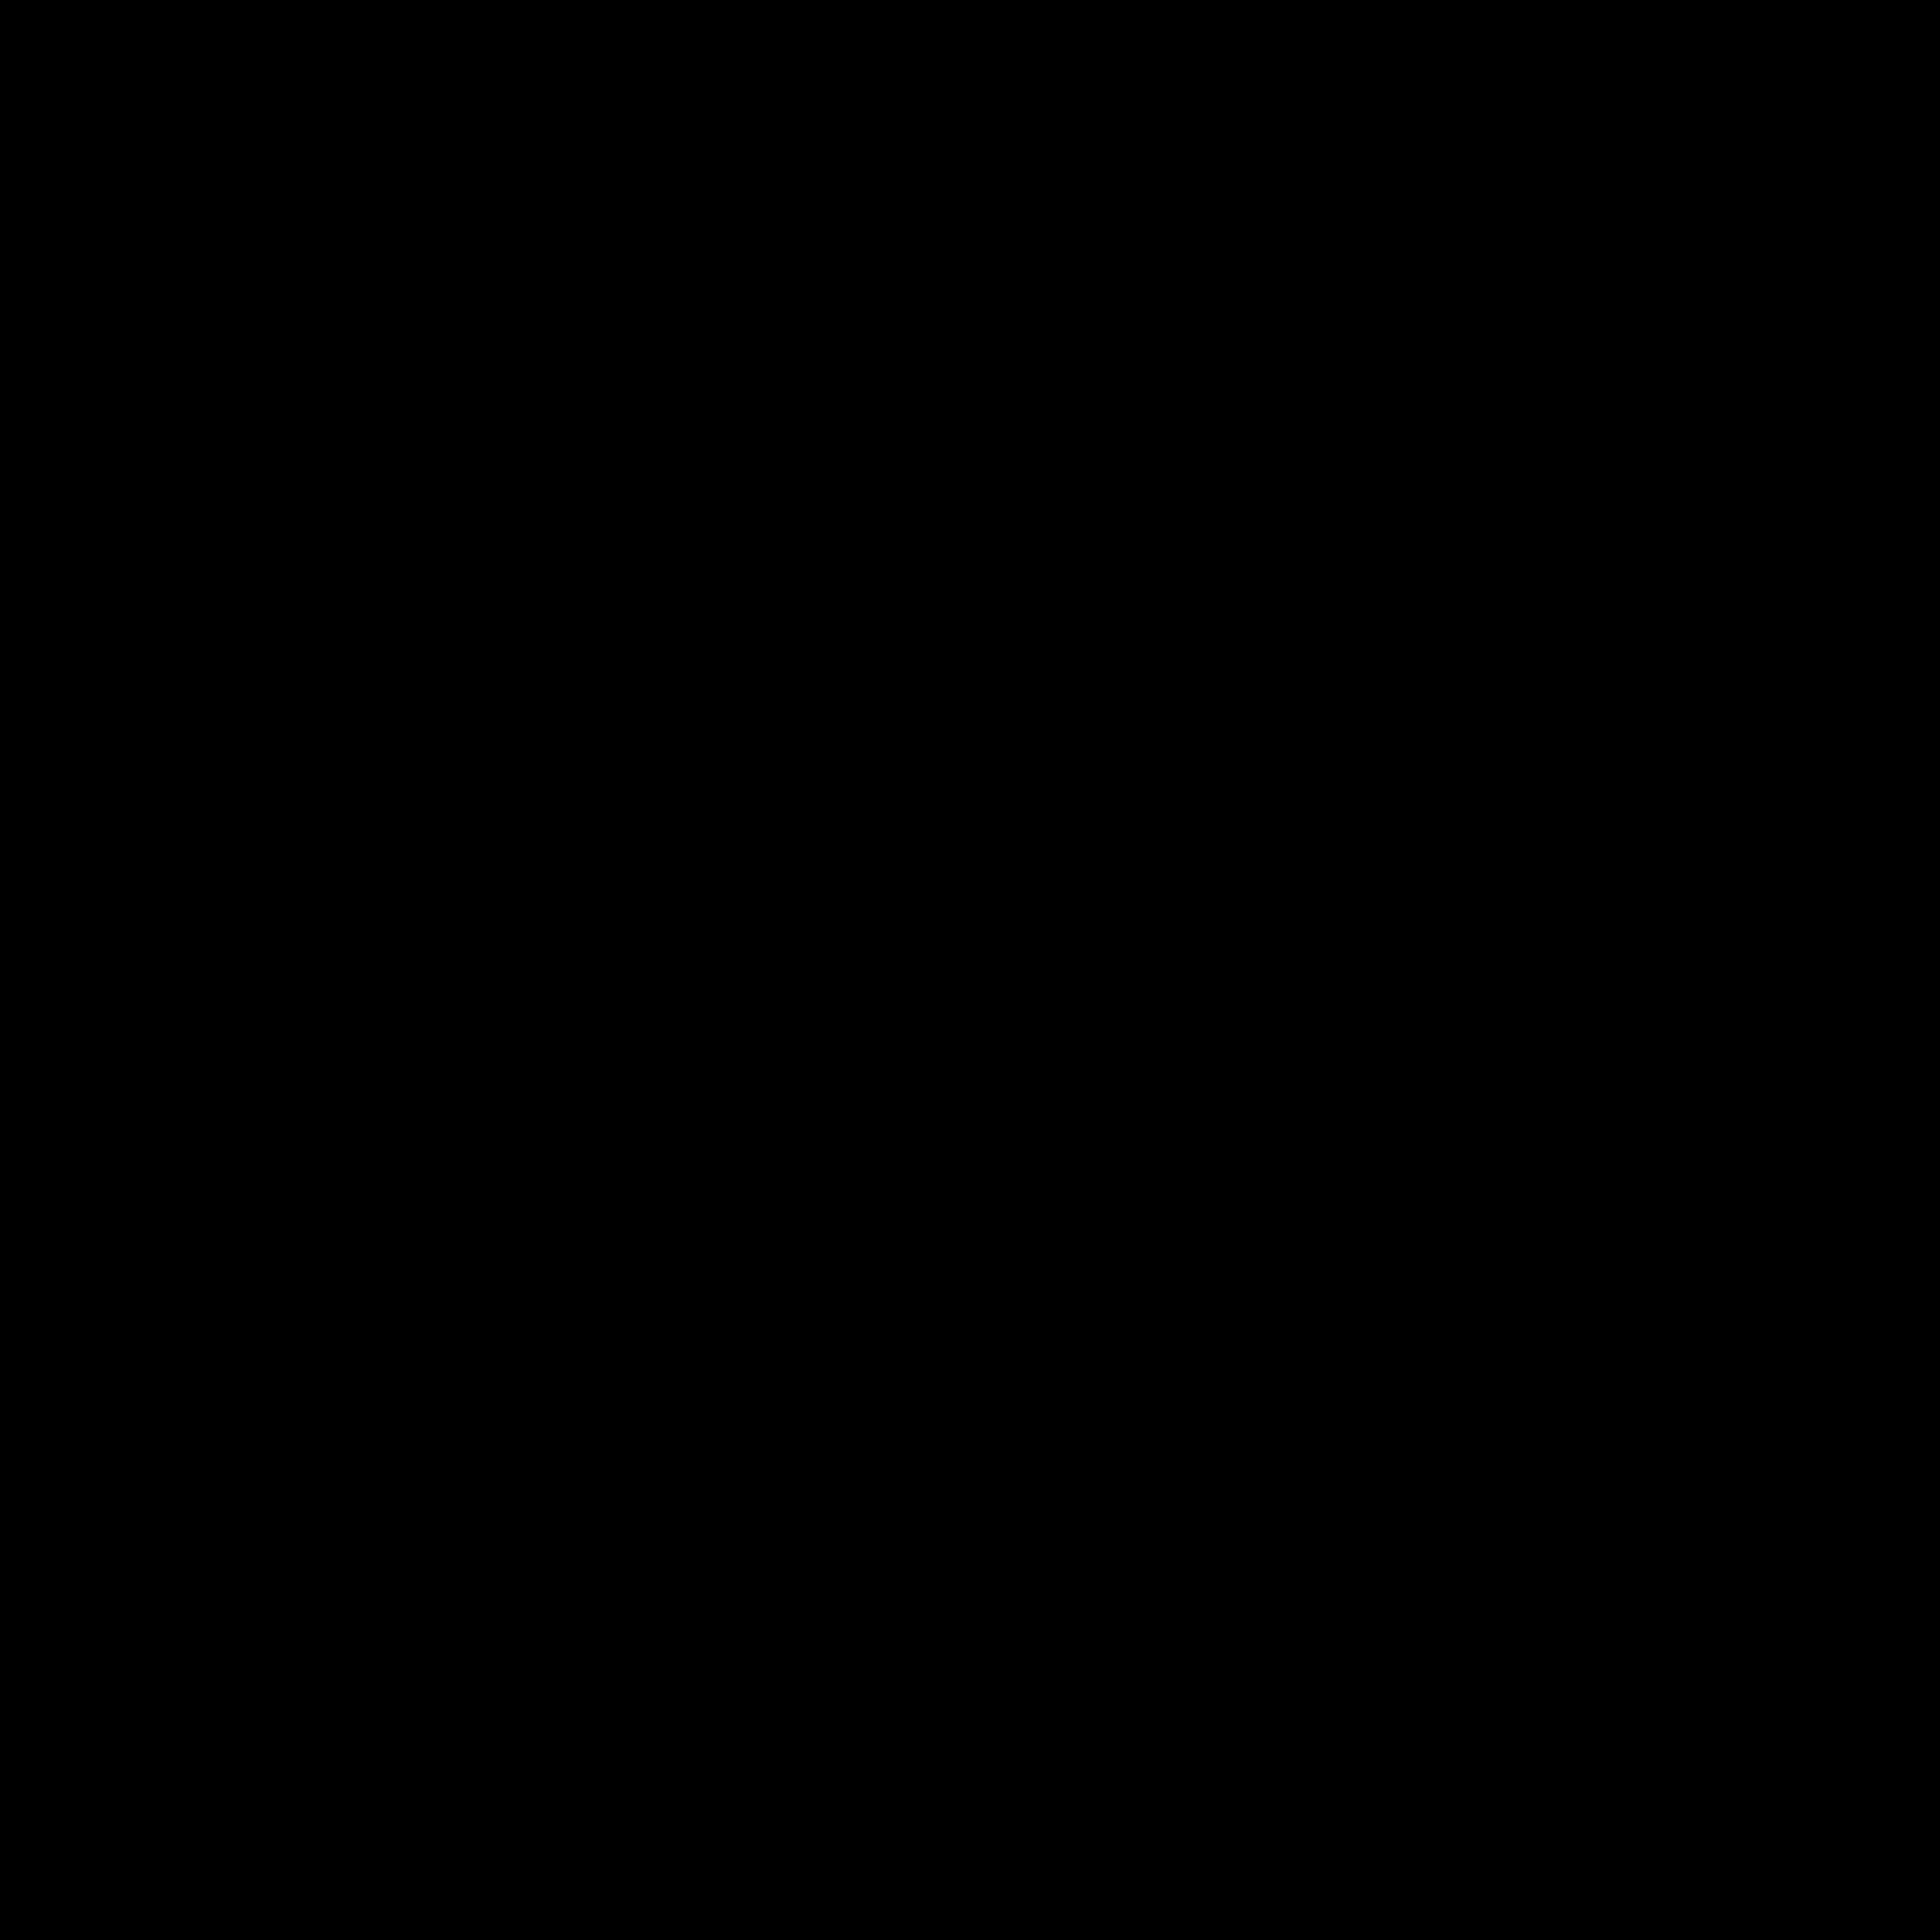 Seal HD PNG - 93206